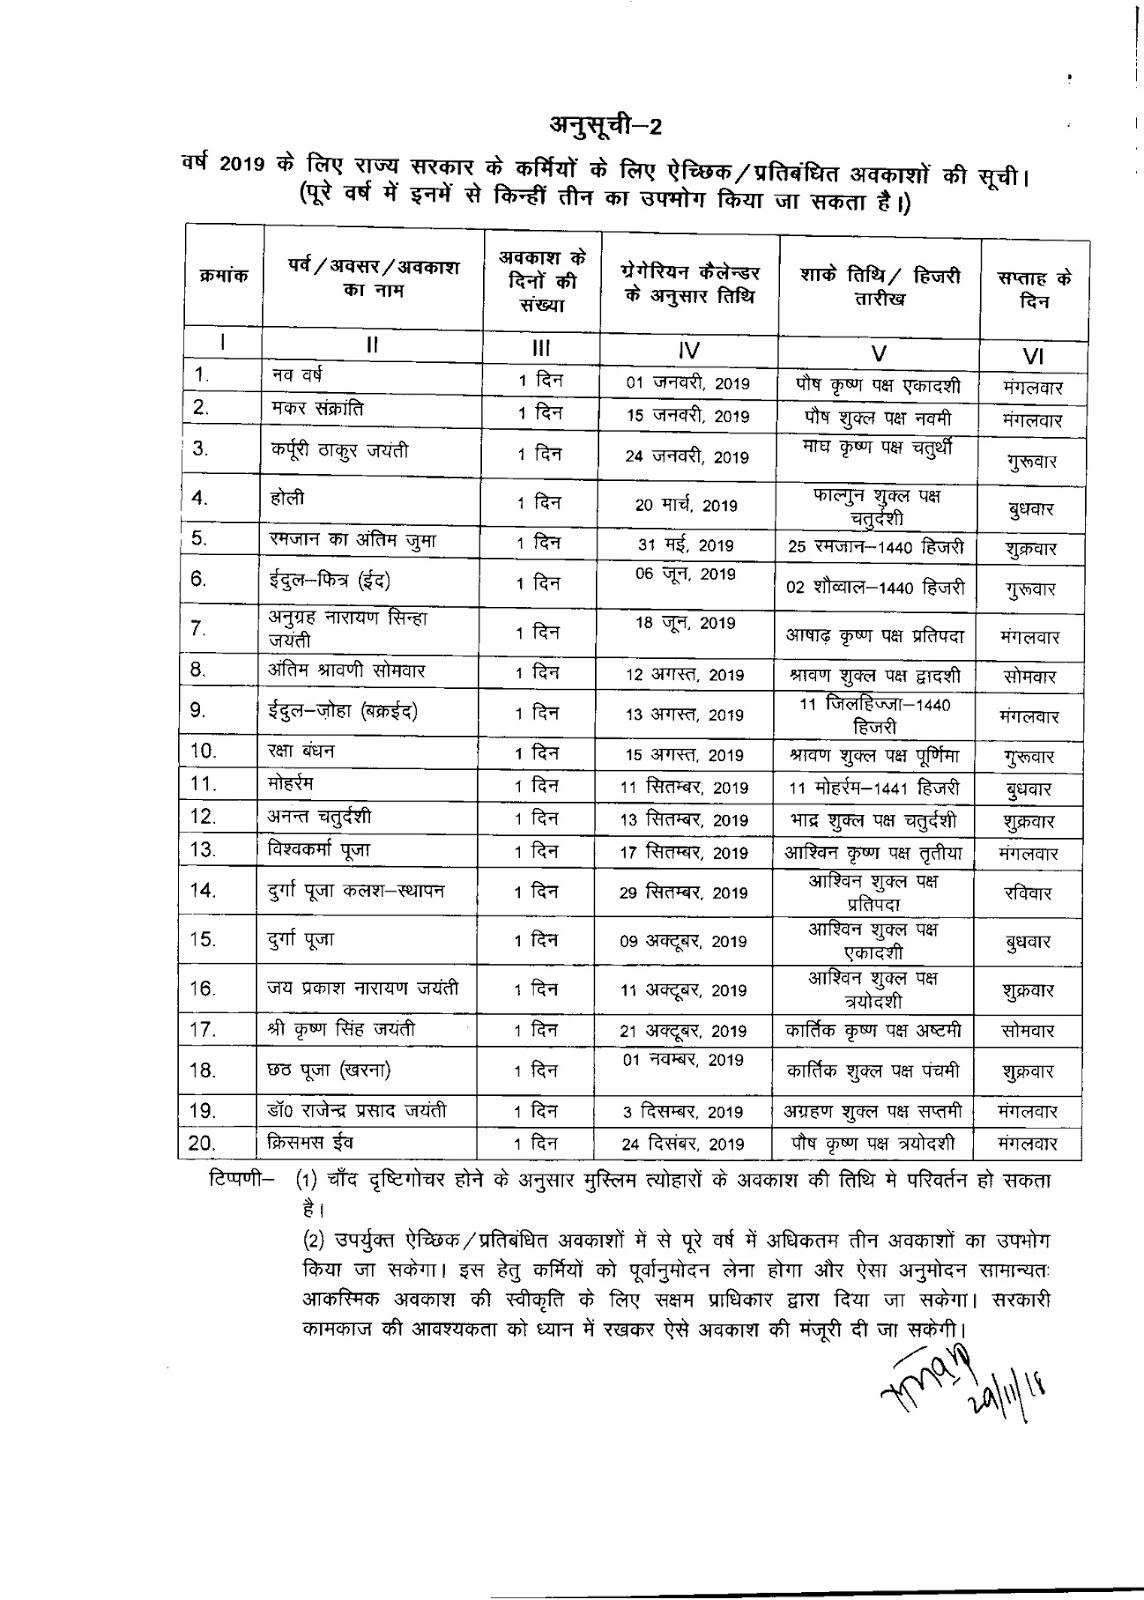 Bihar Sarkar Calendra 2020 | Calendar For Planning in Calendar 2018 Bihar Sarkar